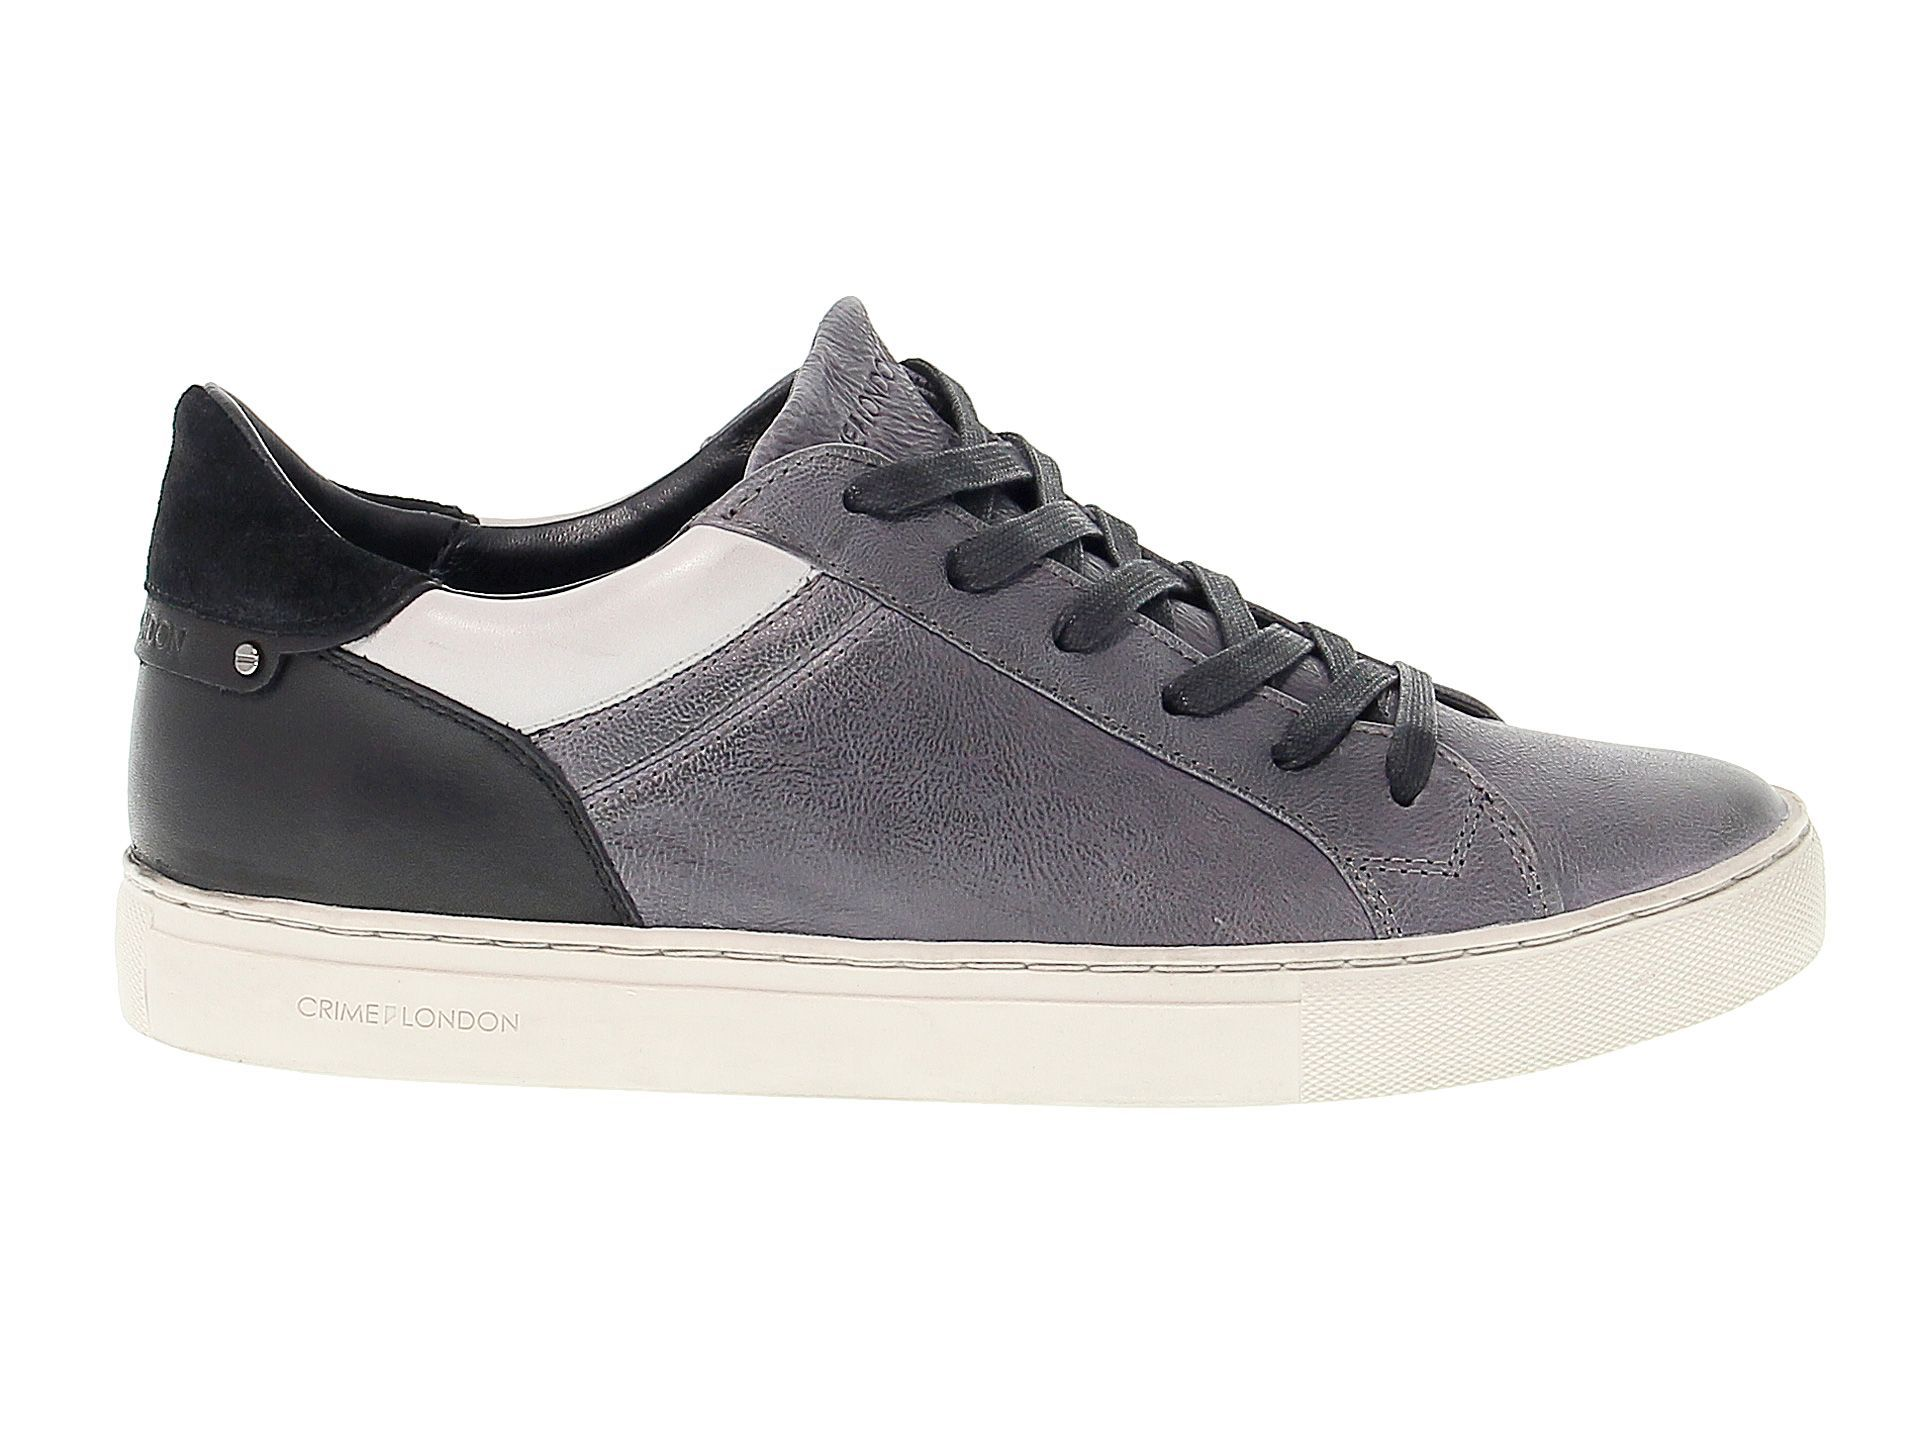 Crime London Men S 11031a1730 Grey Black Suede Sneakers Crimelondon Shoes Suede Sneakers Suede Sneakers